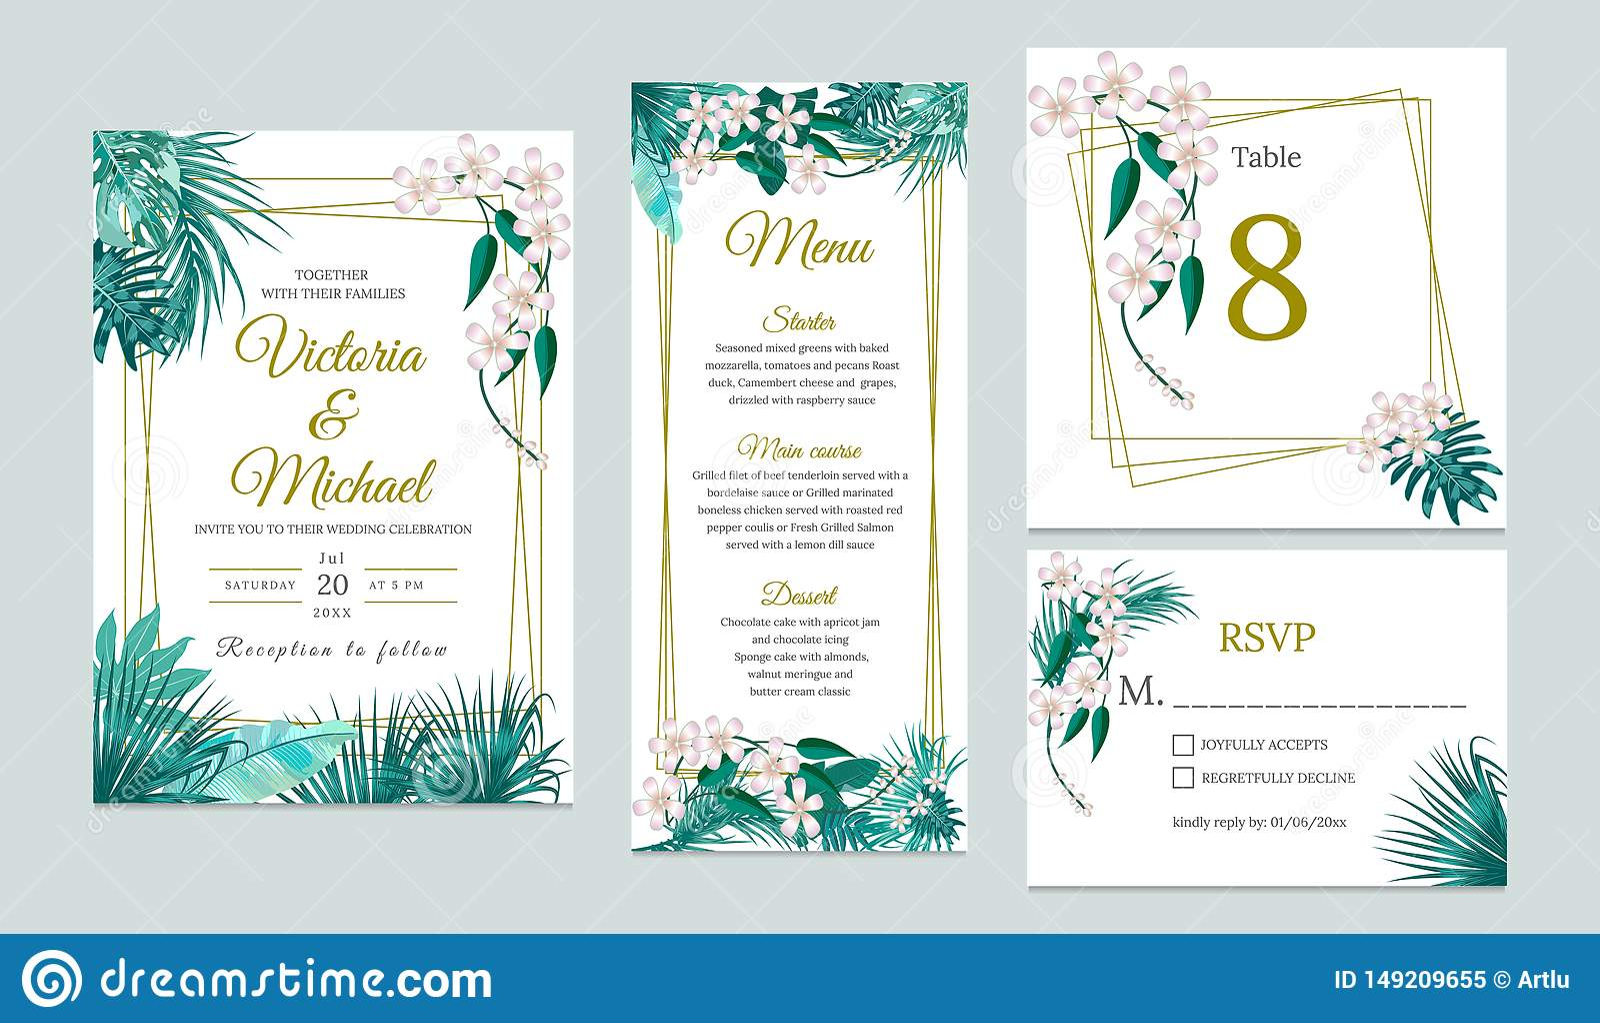 Wedding Invitation Card Design, Floral Invite Stock Vector - Illustration  of background, invitation: 149209655